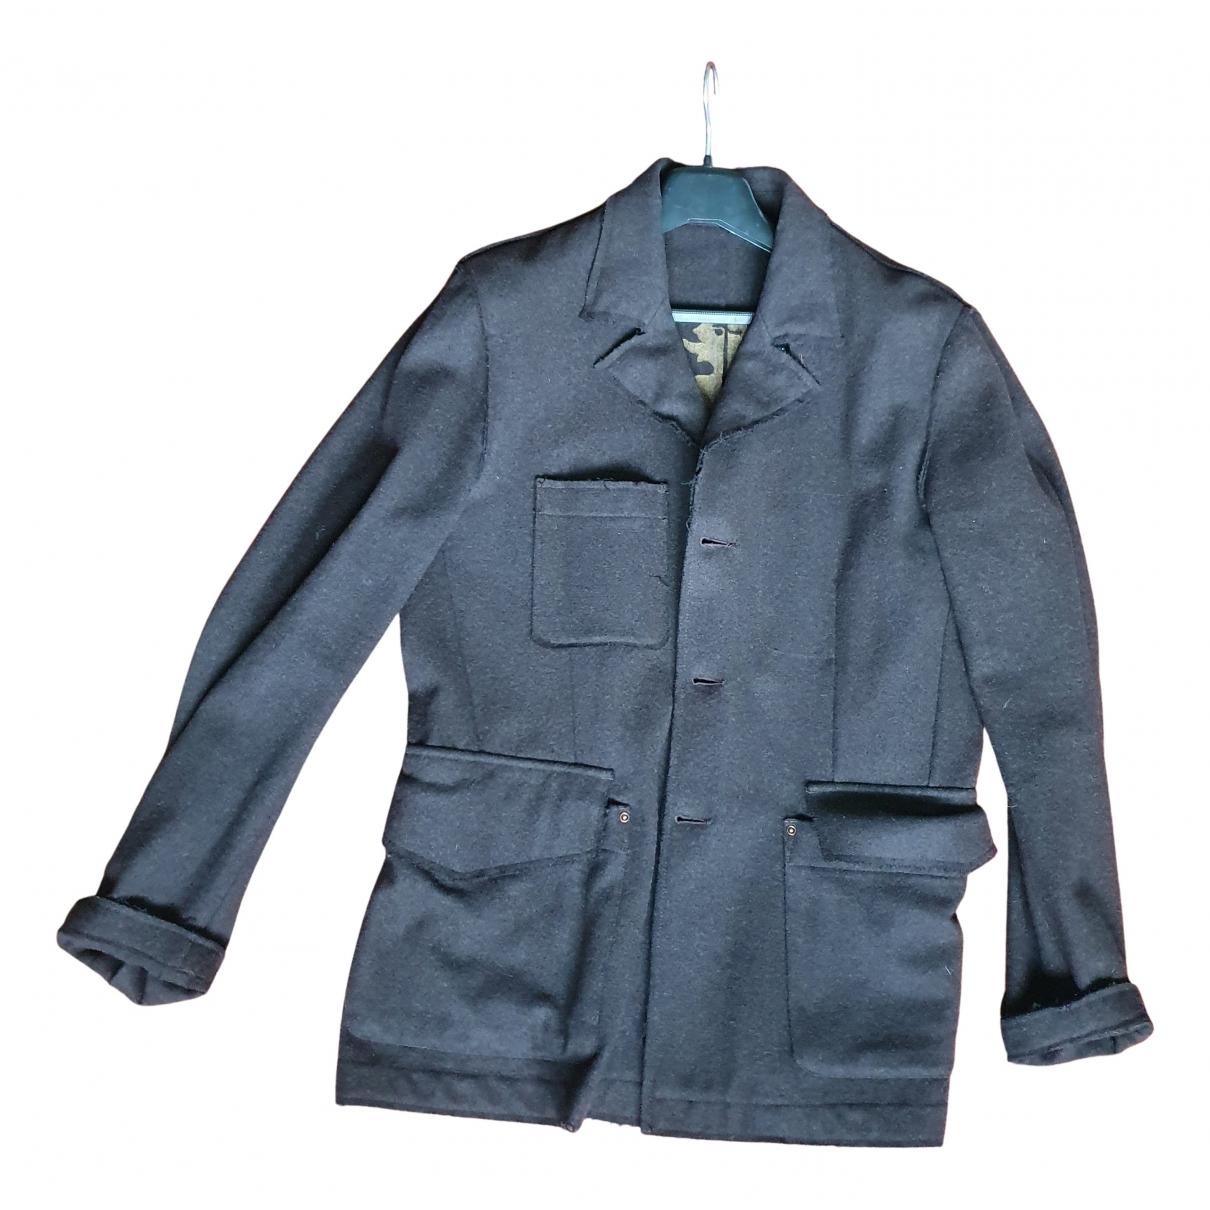 Mauro Grifoni N Brown Wool jacket  for Men 50 IT